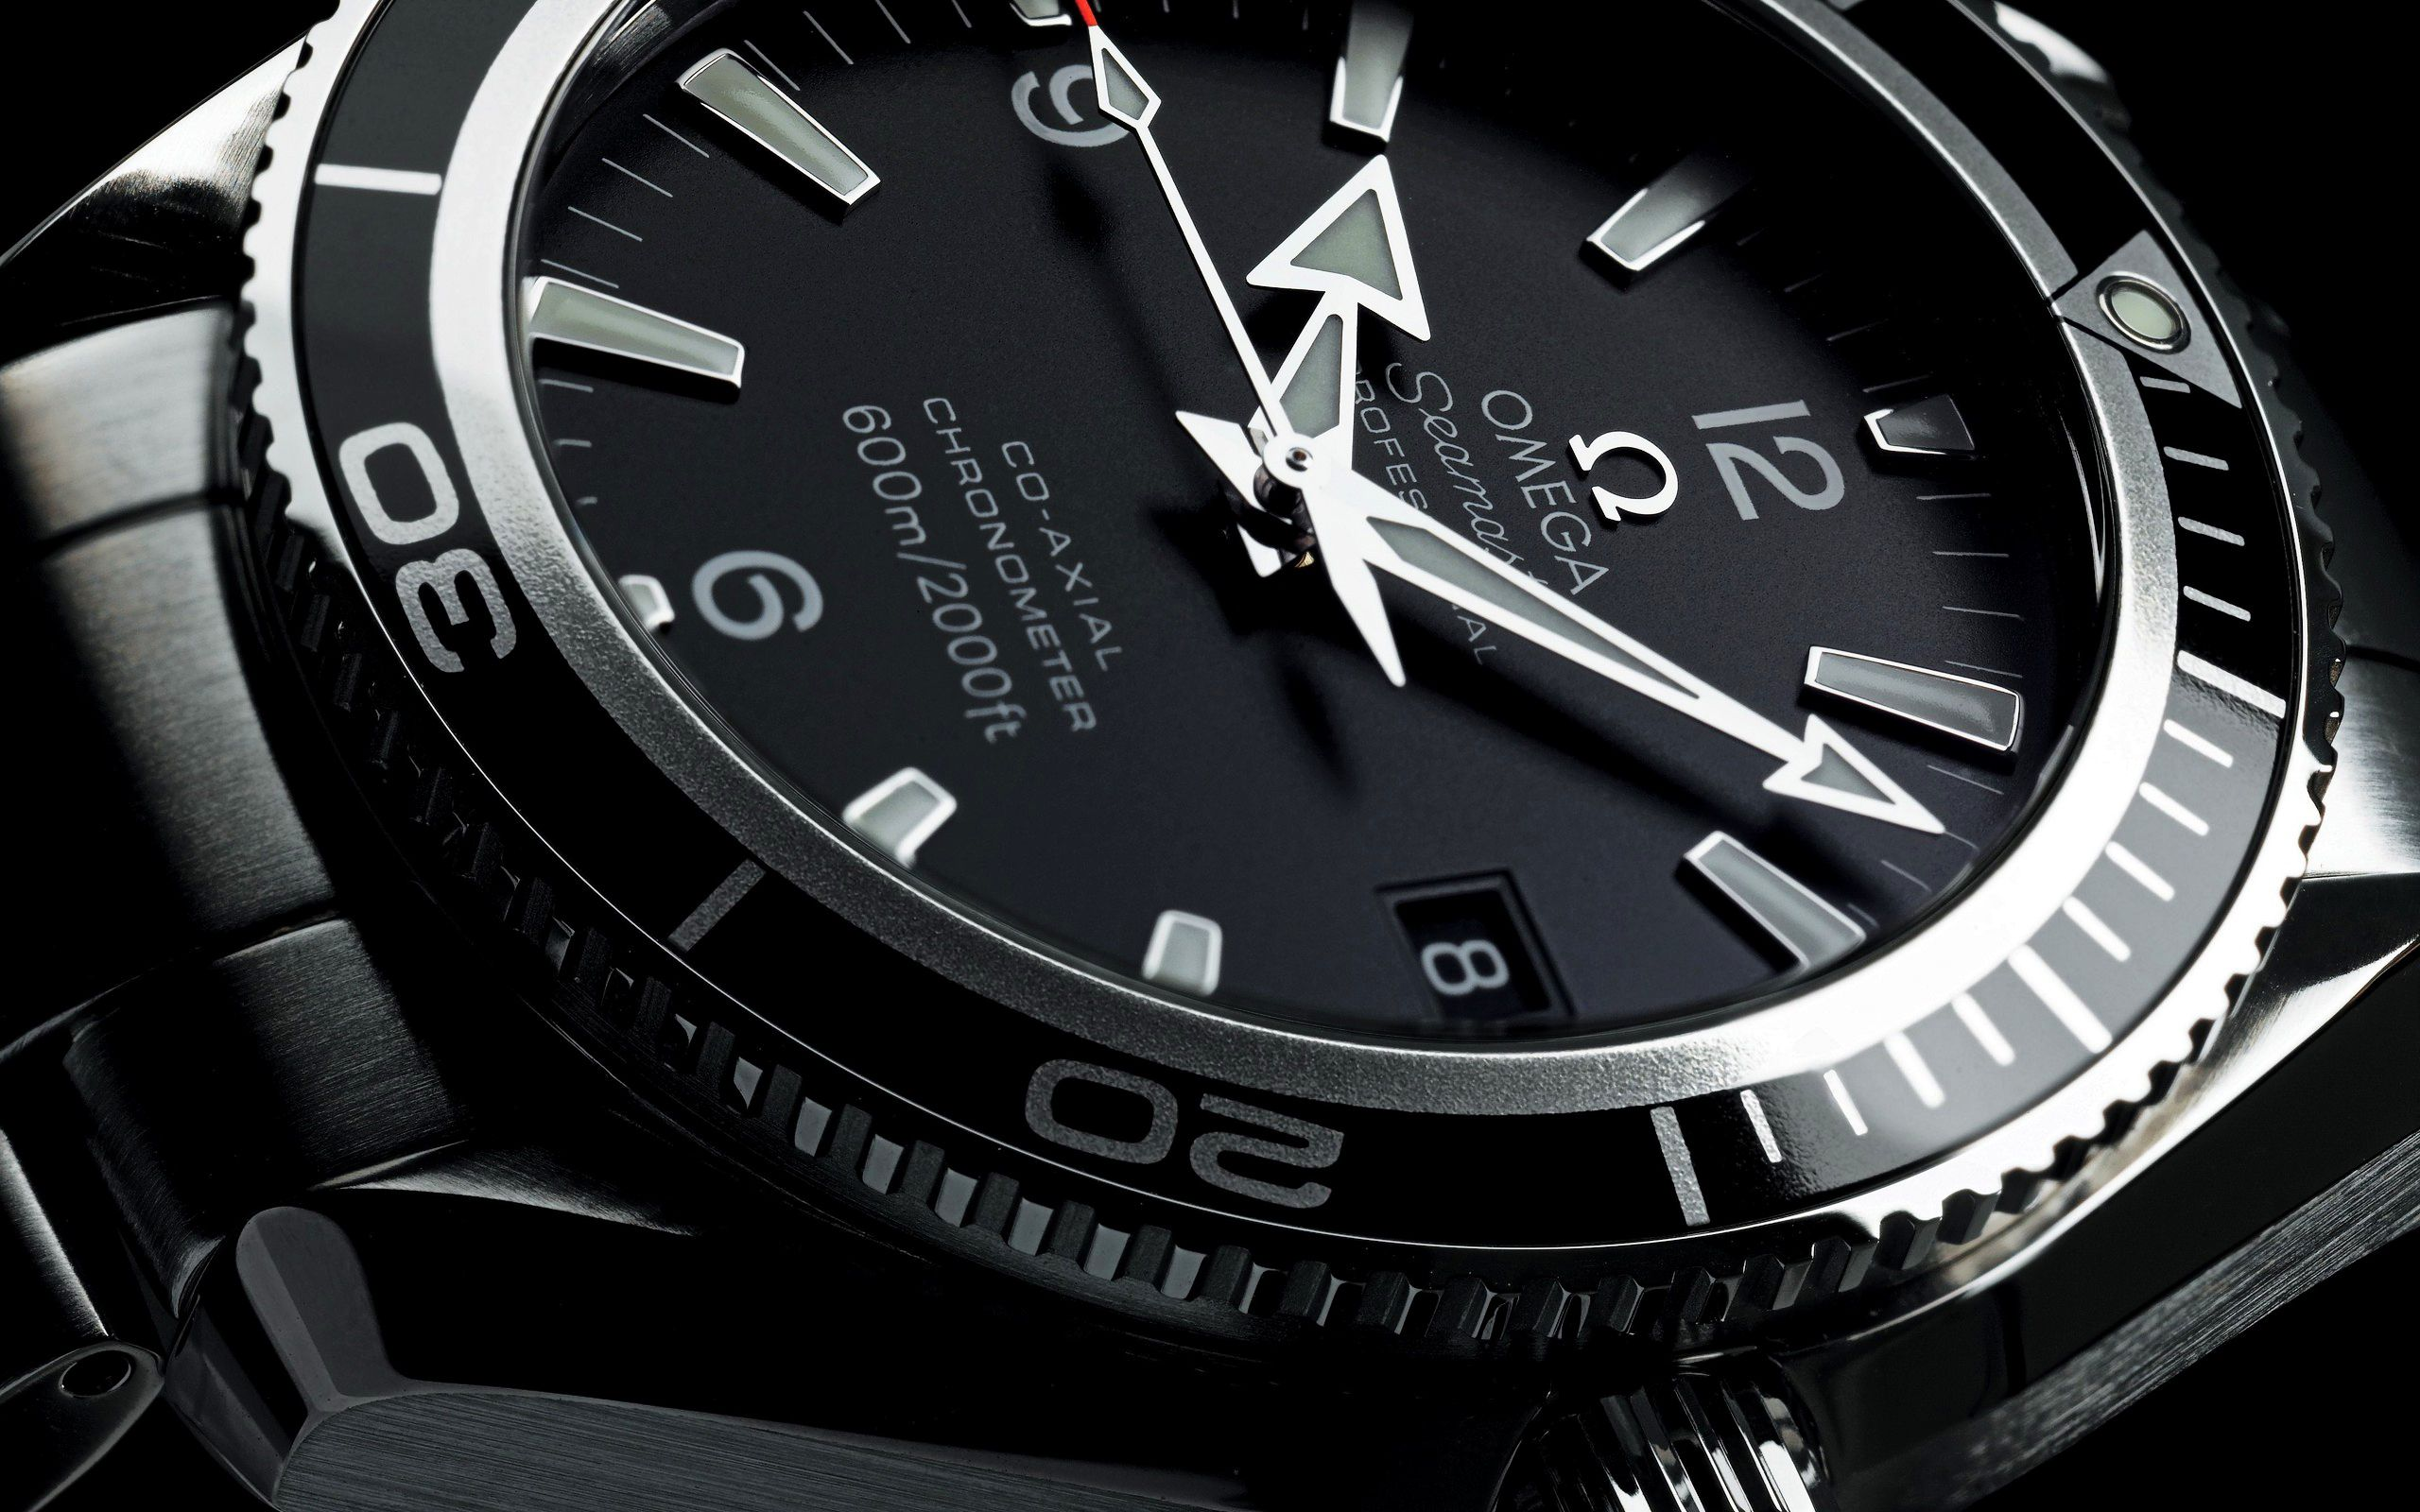 Wear luxury watch and feel royalties #menswatch #manicsales http://goo.gl/1KiKzf